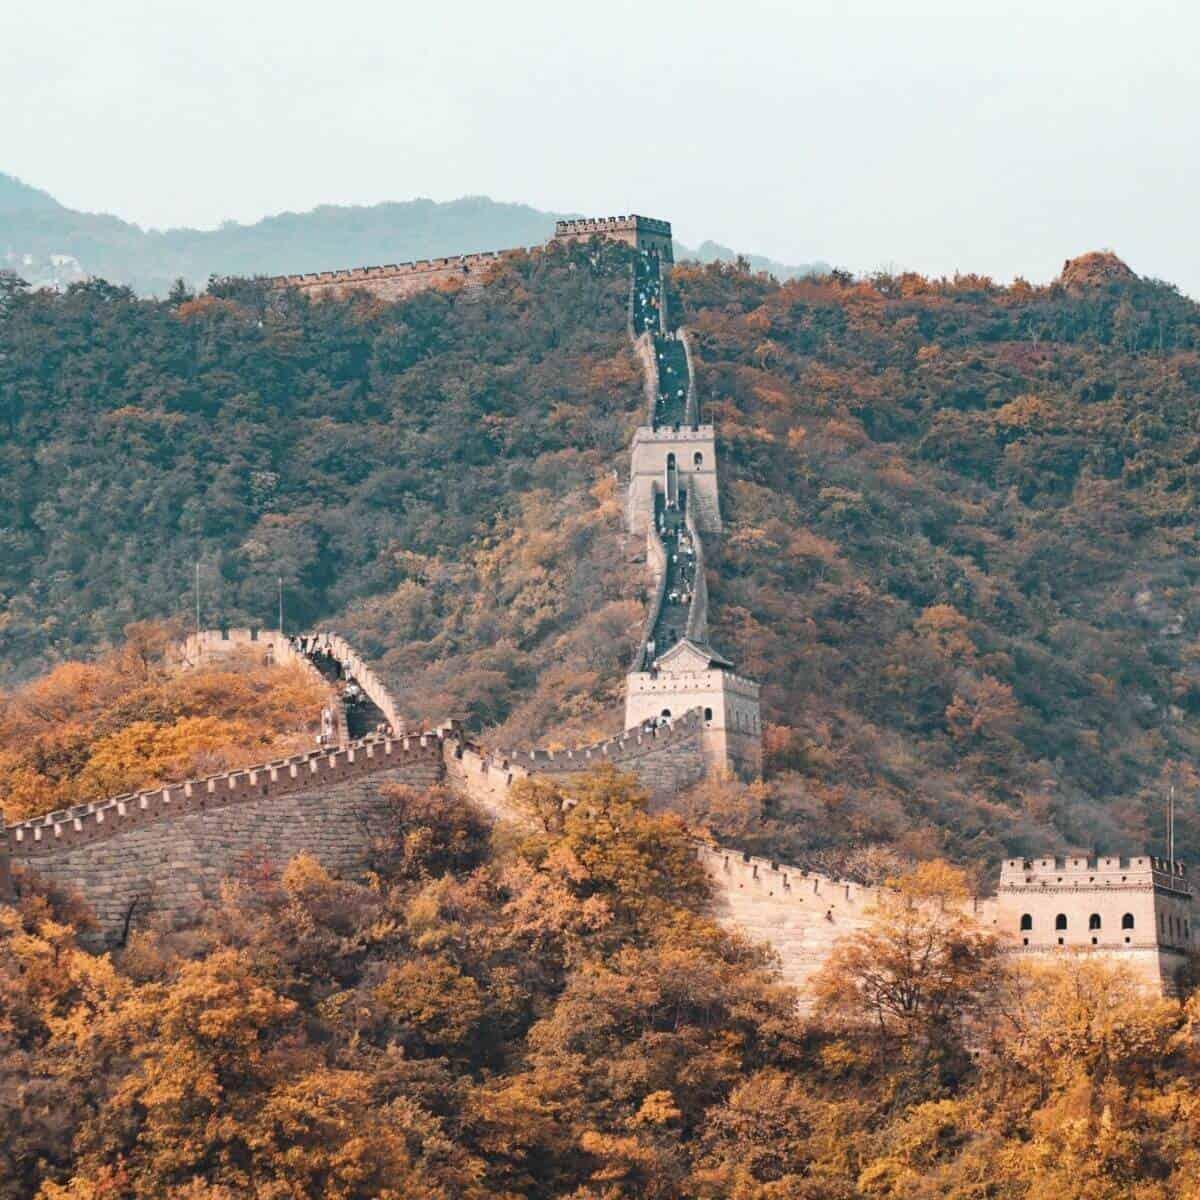 Great Wall of China during the Fall season.